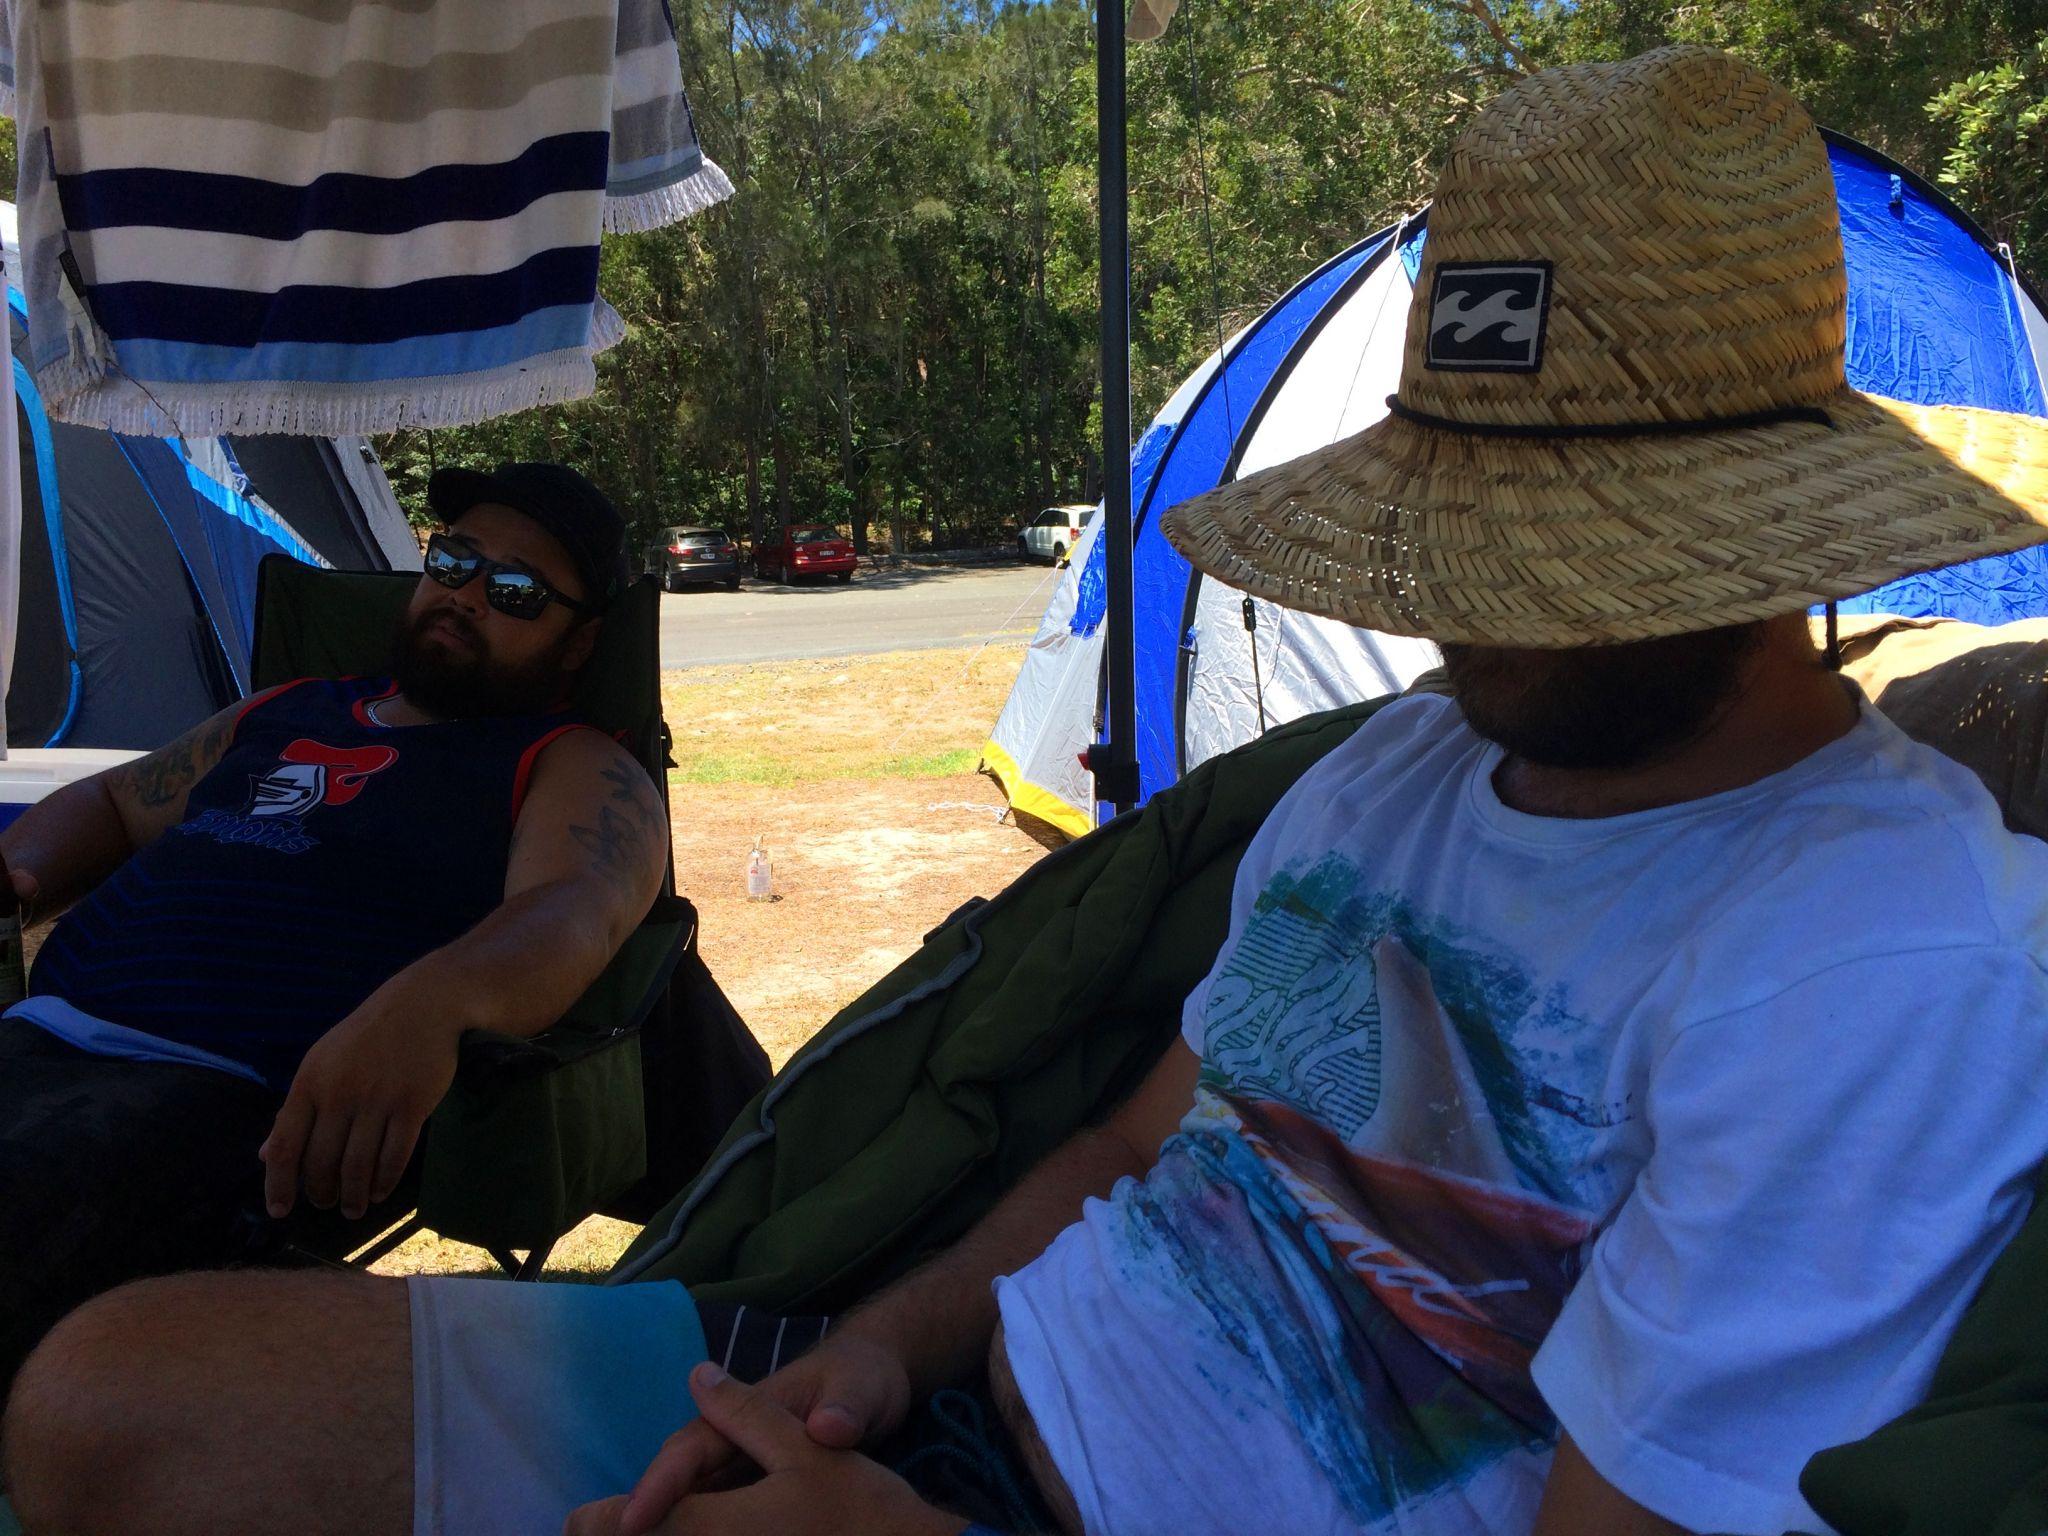 Boys sleeping at Campsite